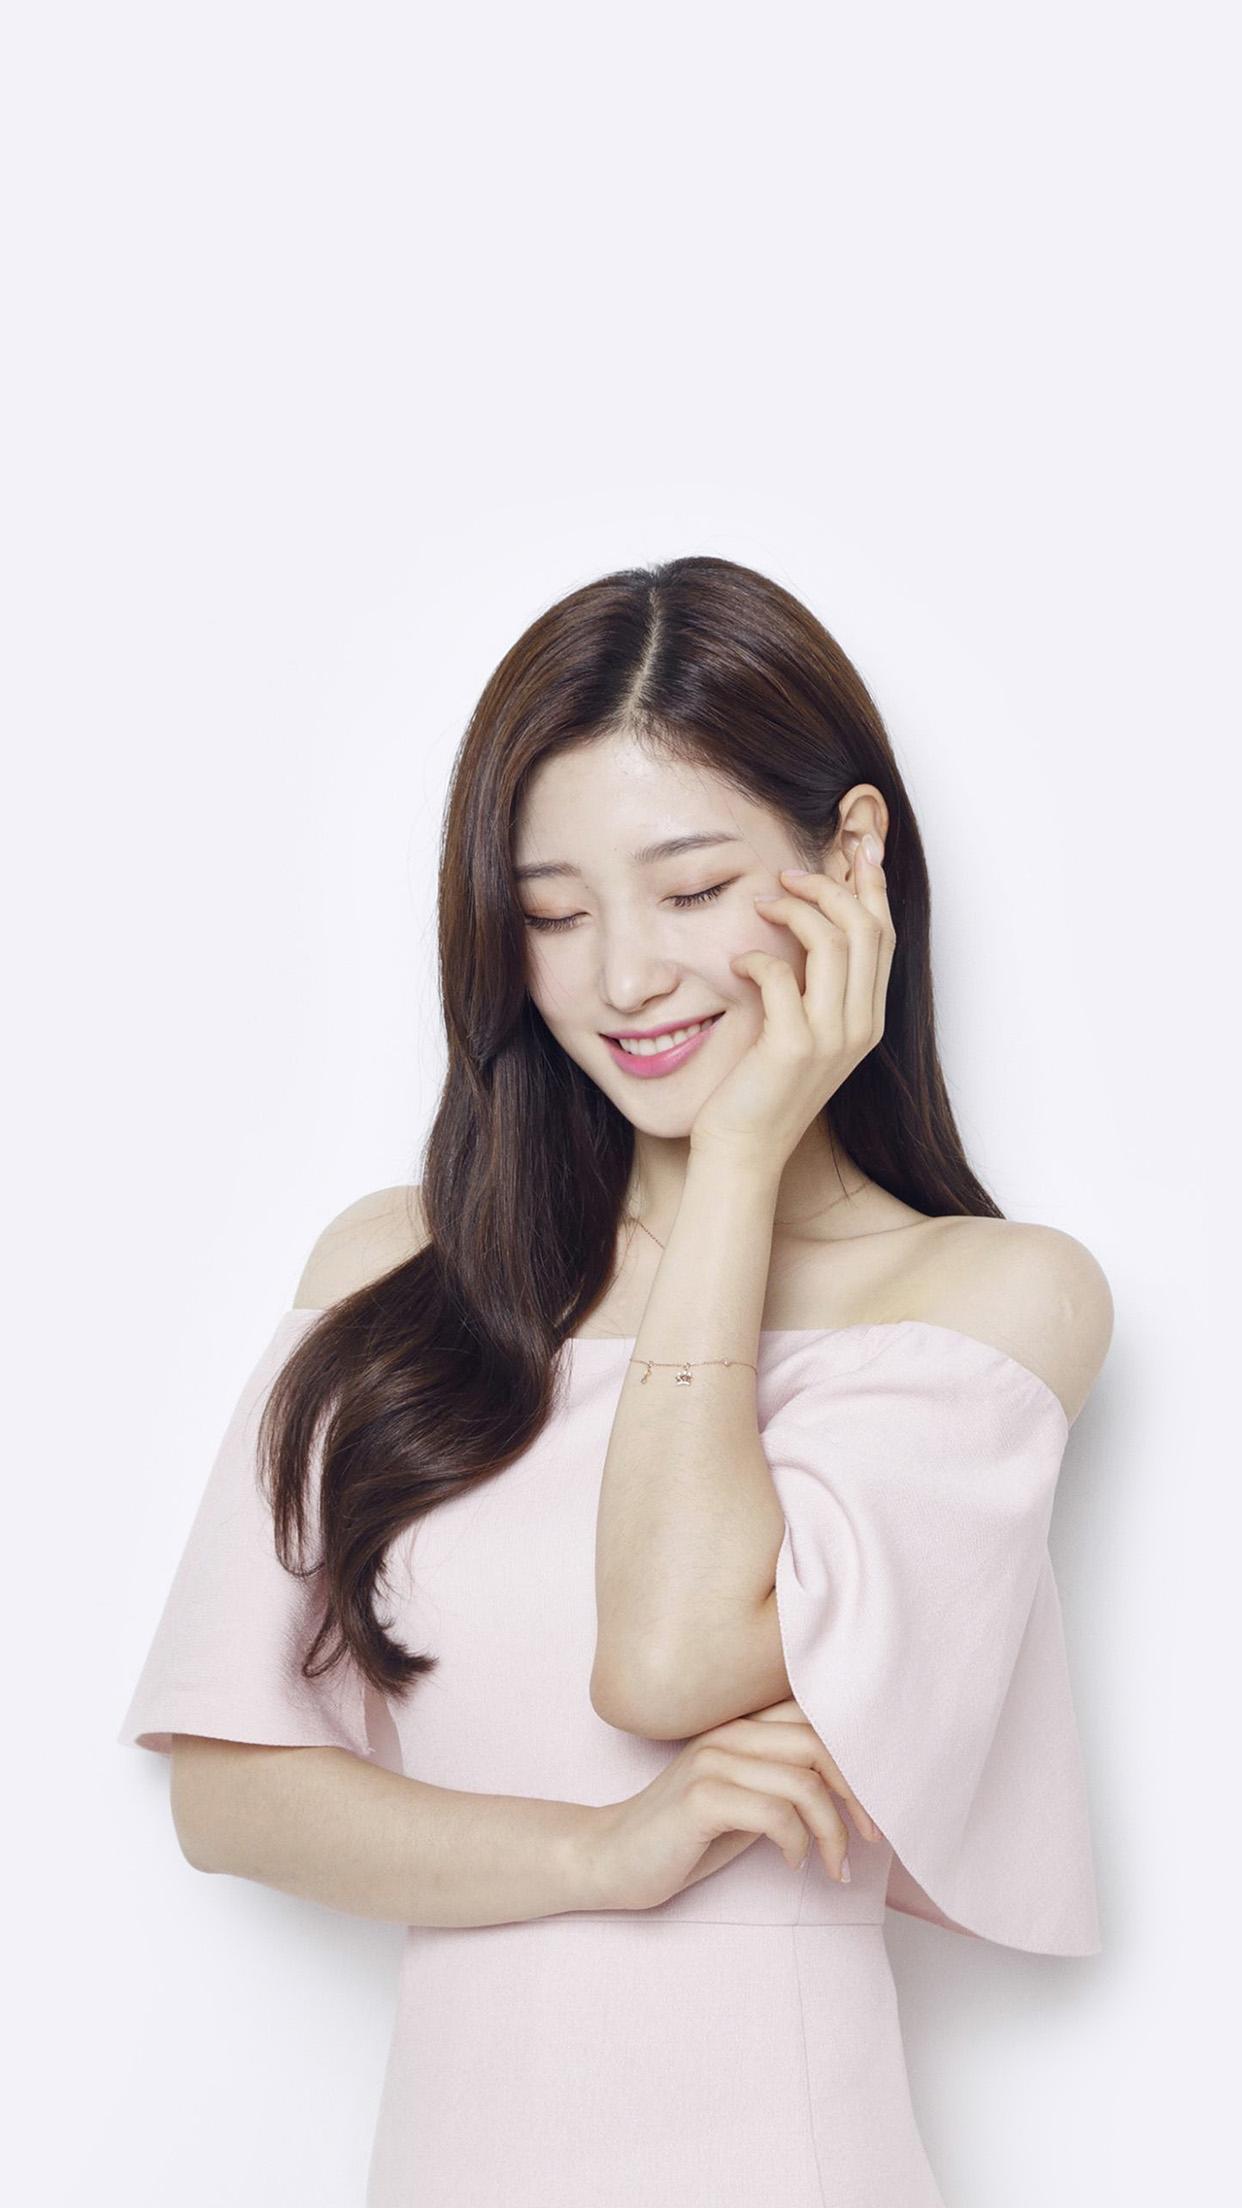 hn45-pink-cute-girl-kpop-ioi-wallpaper